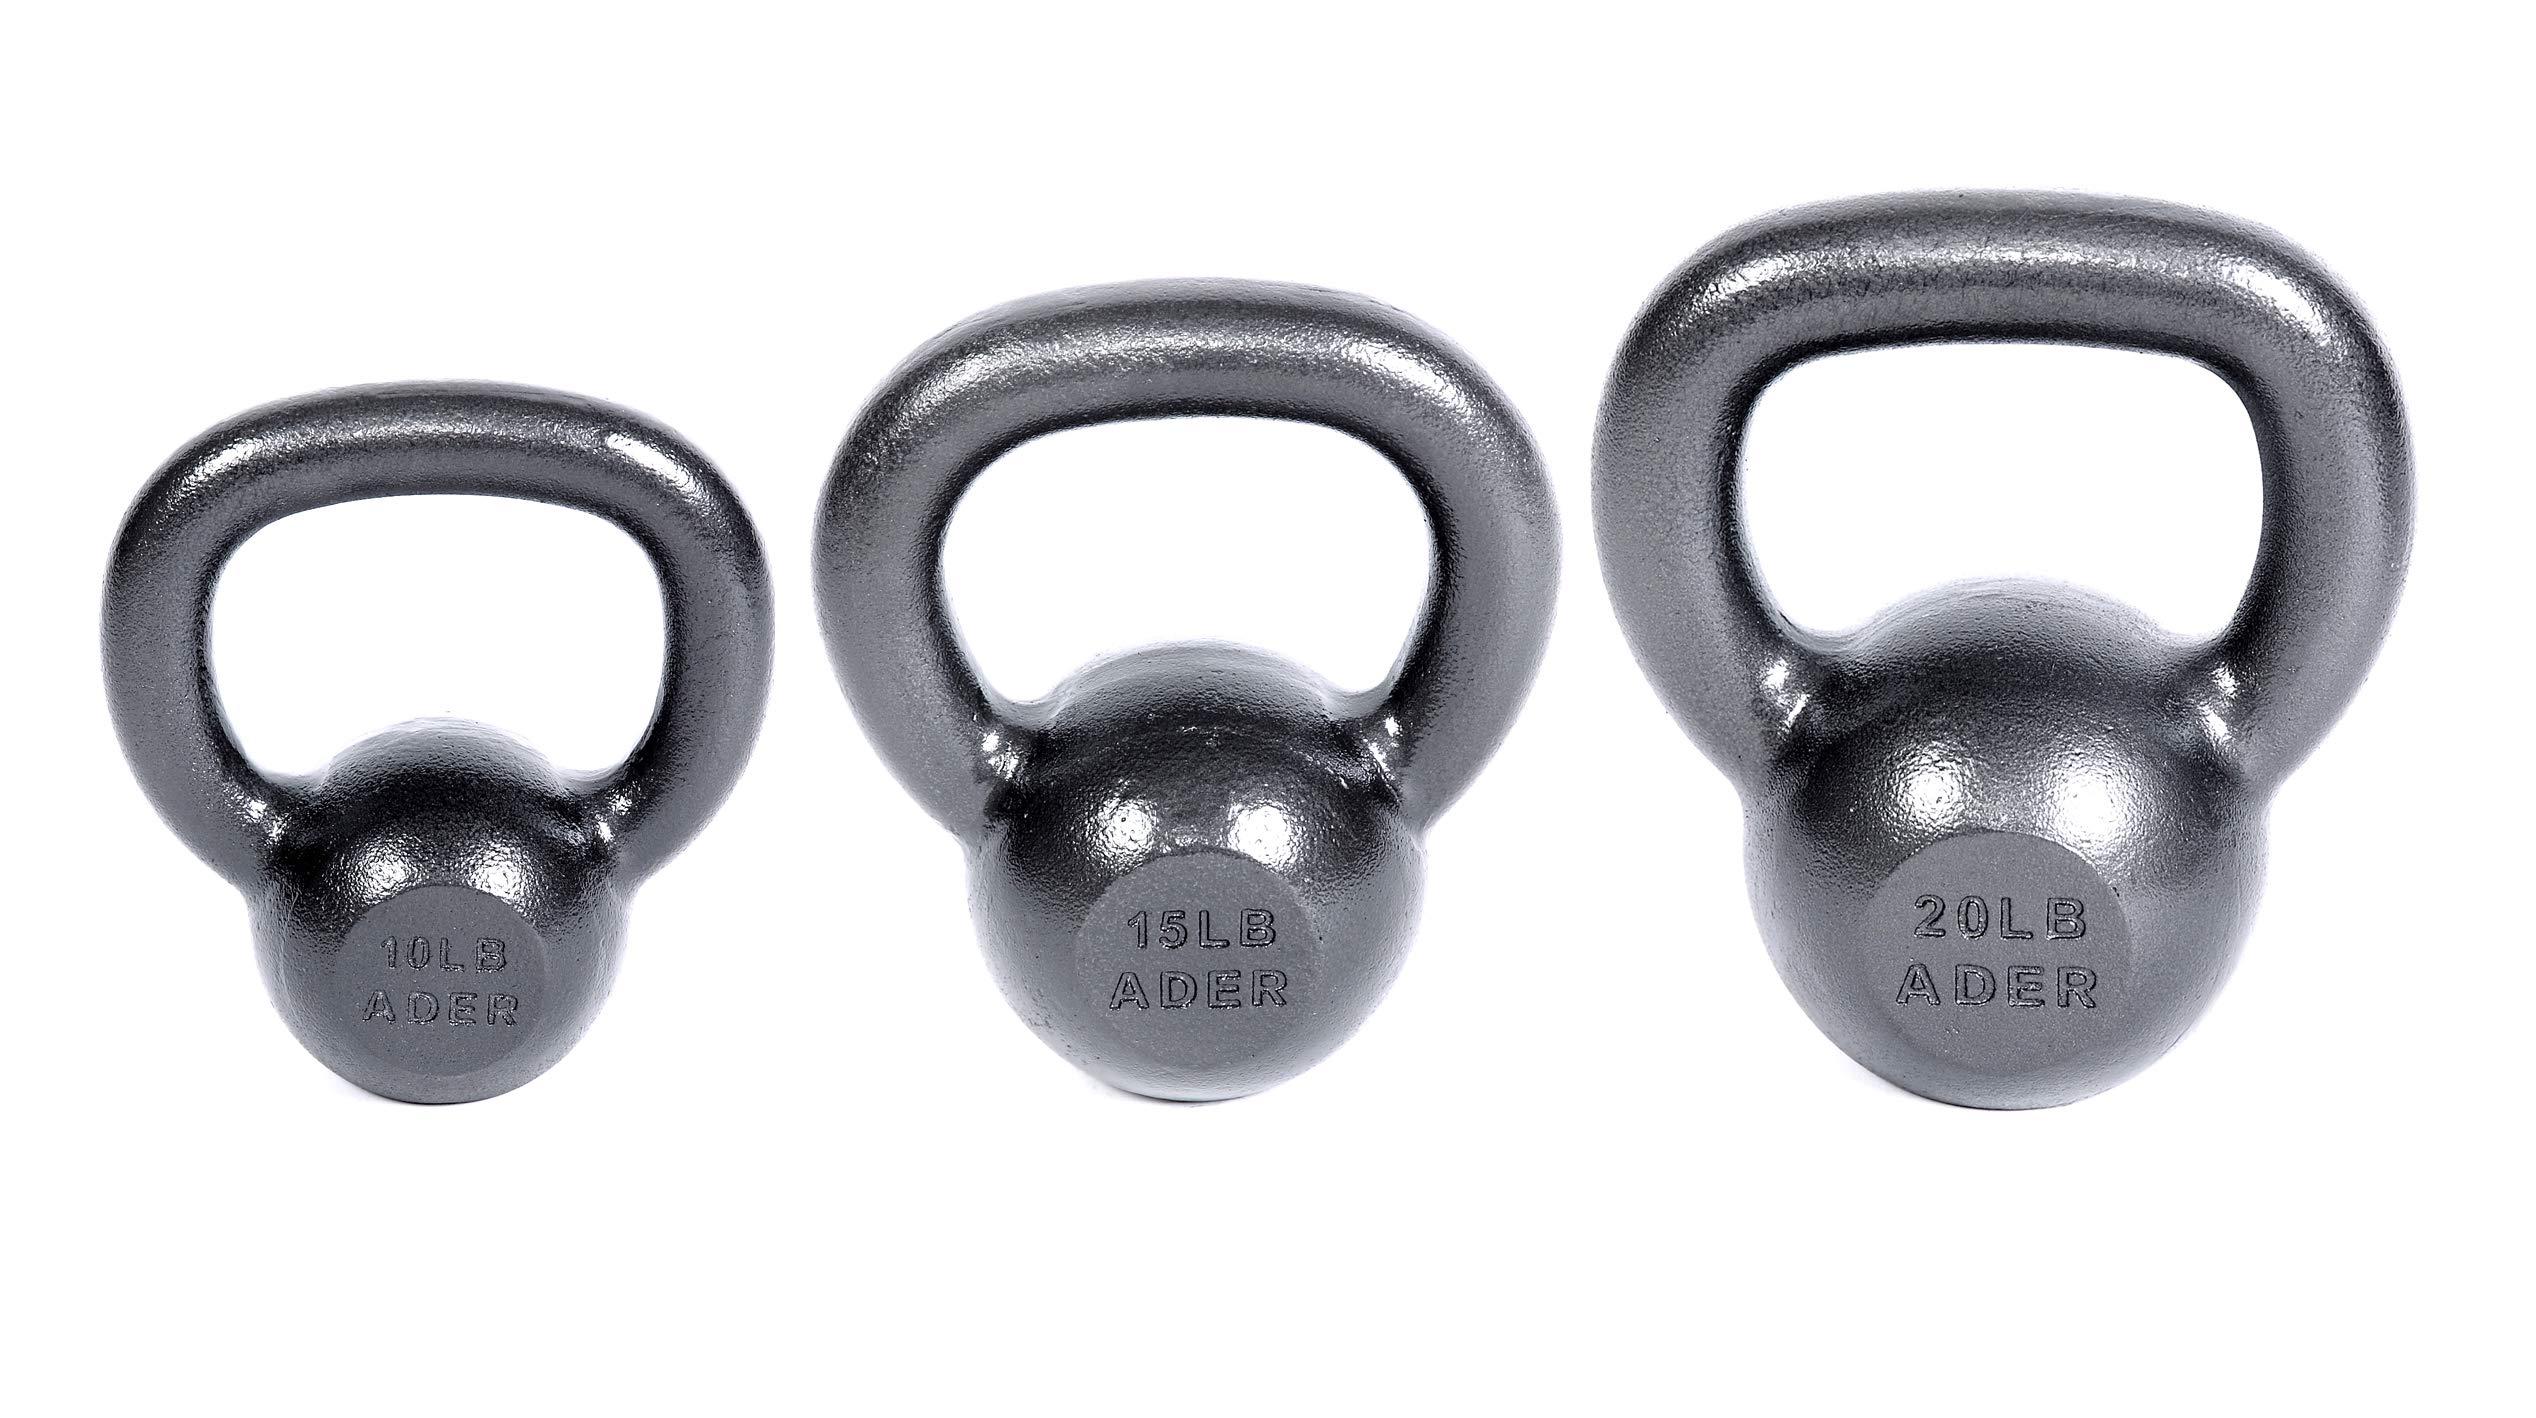 Ader Premier Kettlebell Weights Set- (10, 15, 20 Lb) w/DVD